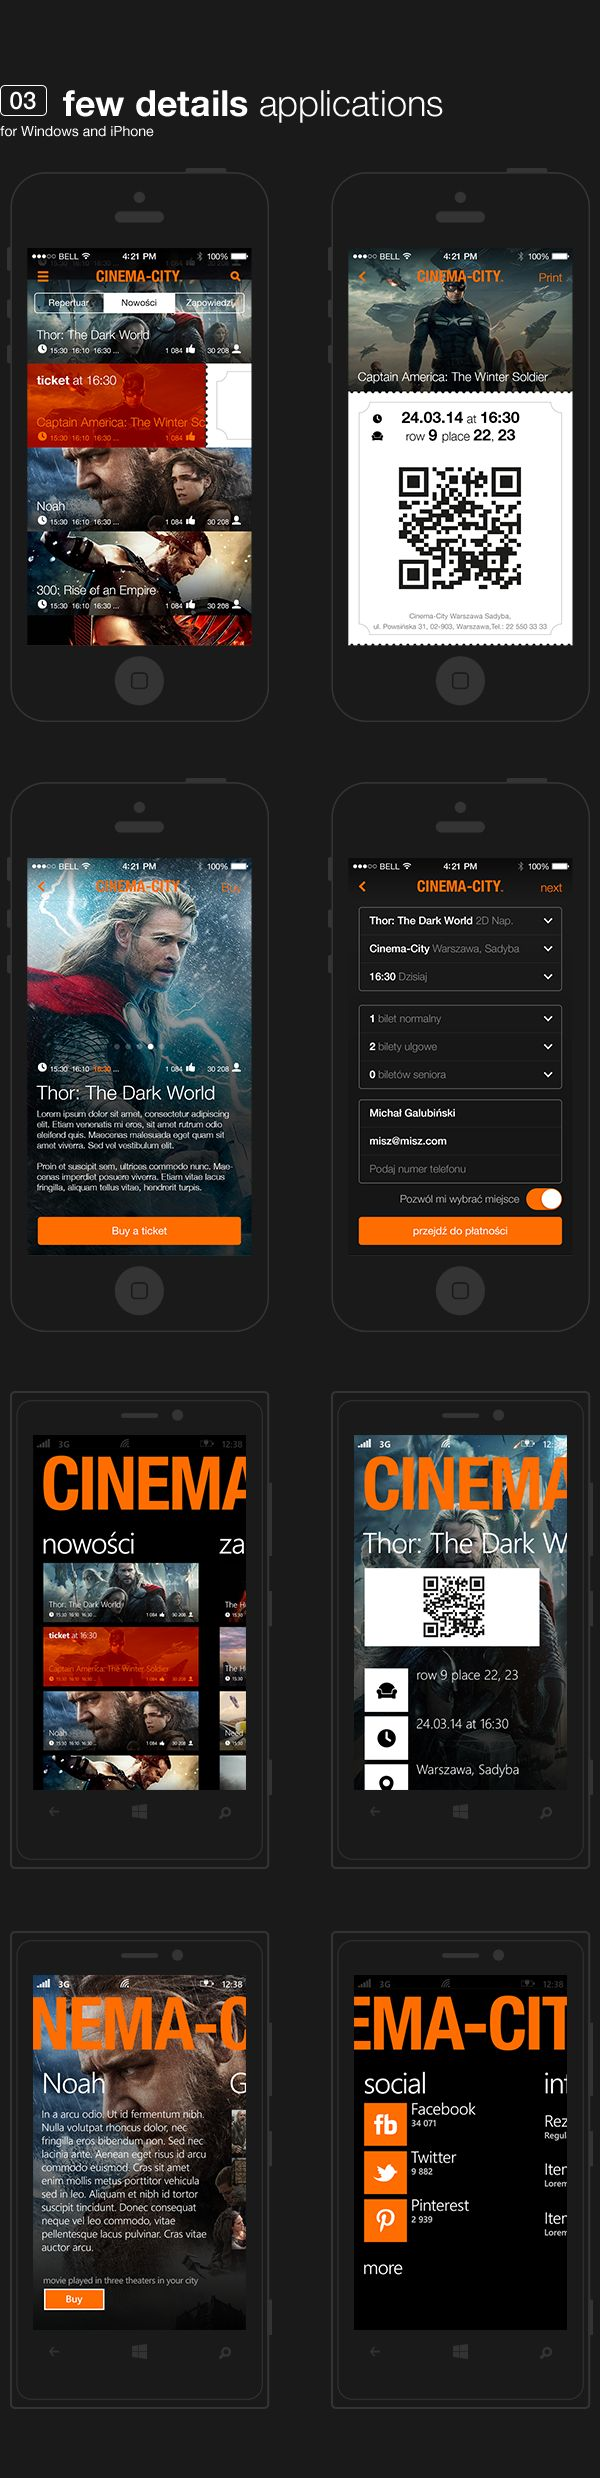 Cinema-City concept app by Michal Galubinski, via Behance